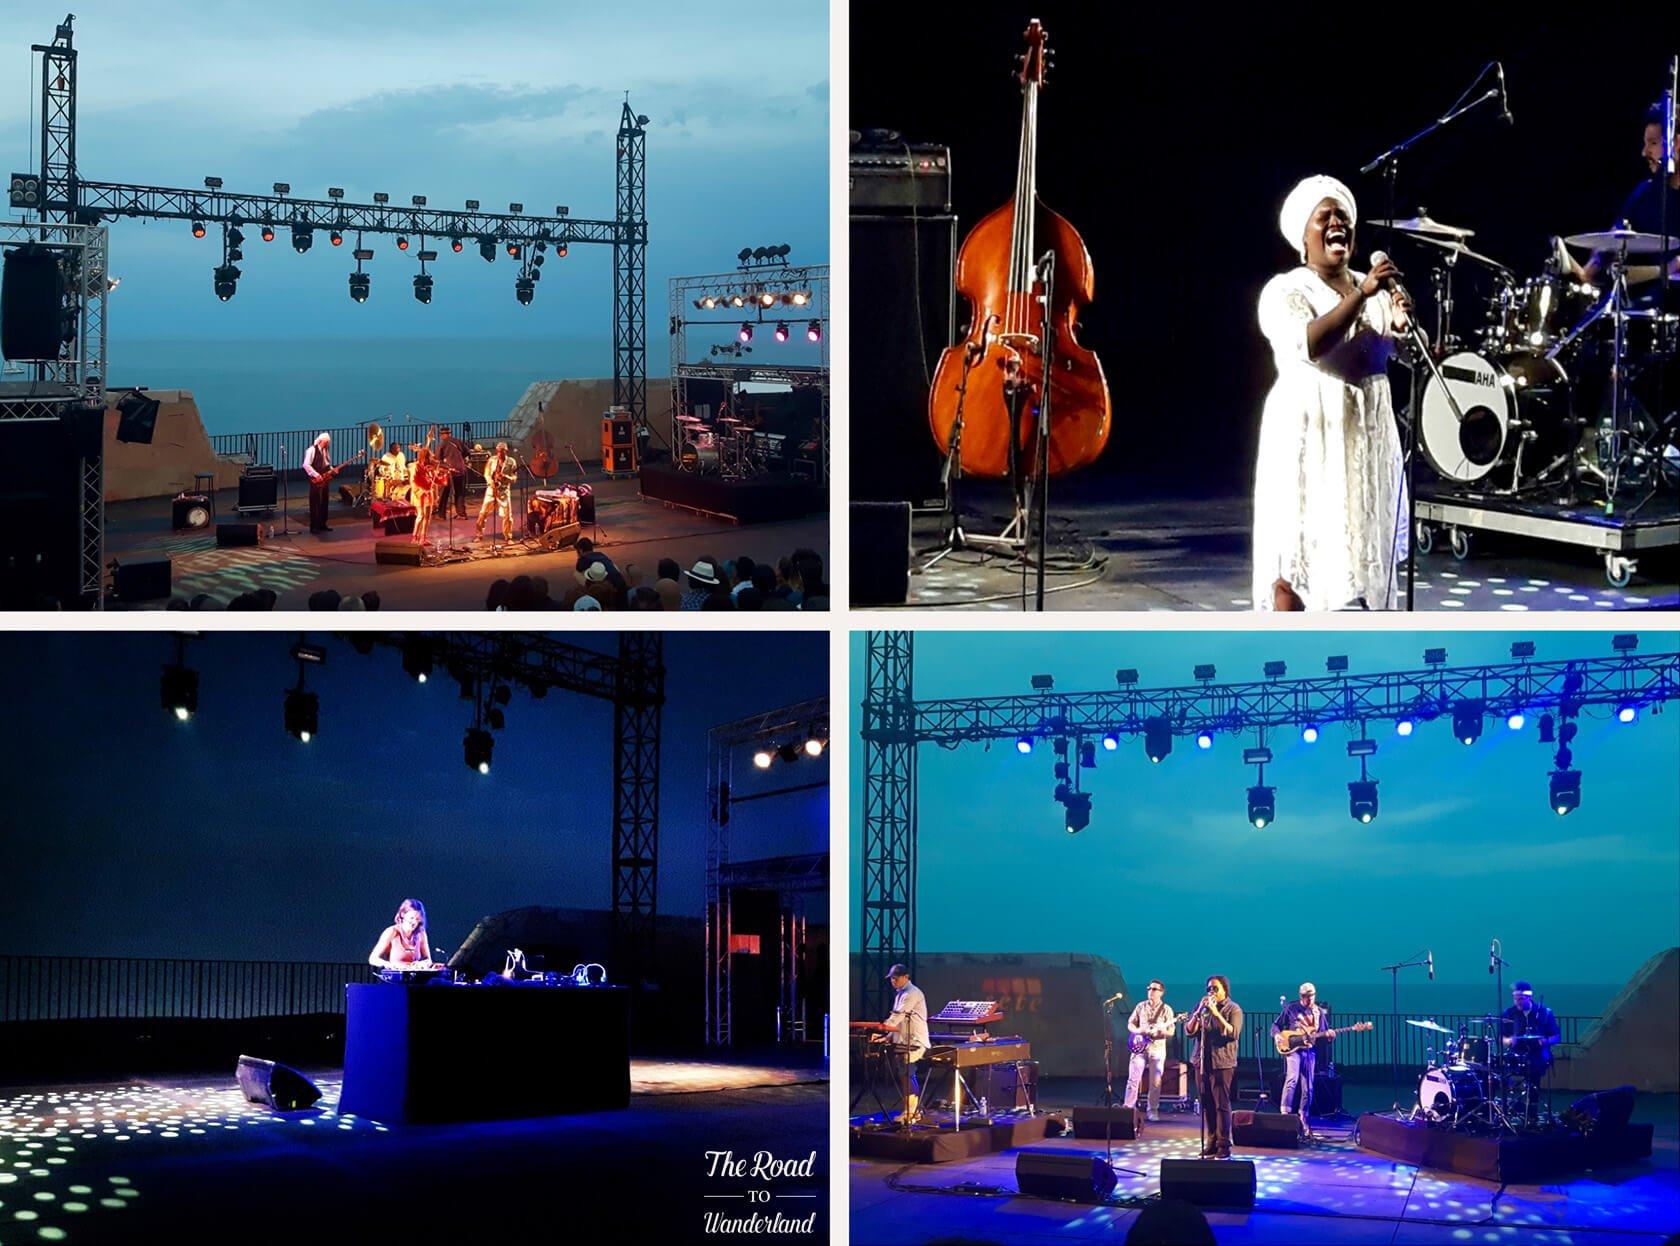 Worldwide Festival, Sète: The music